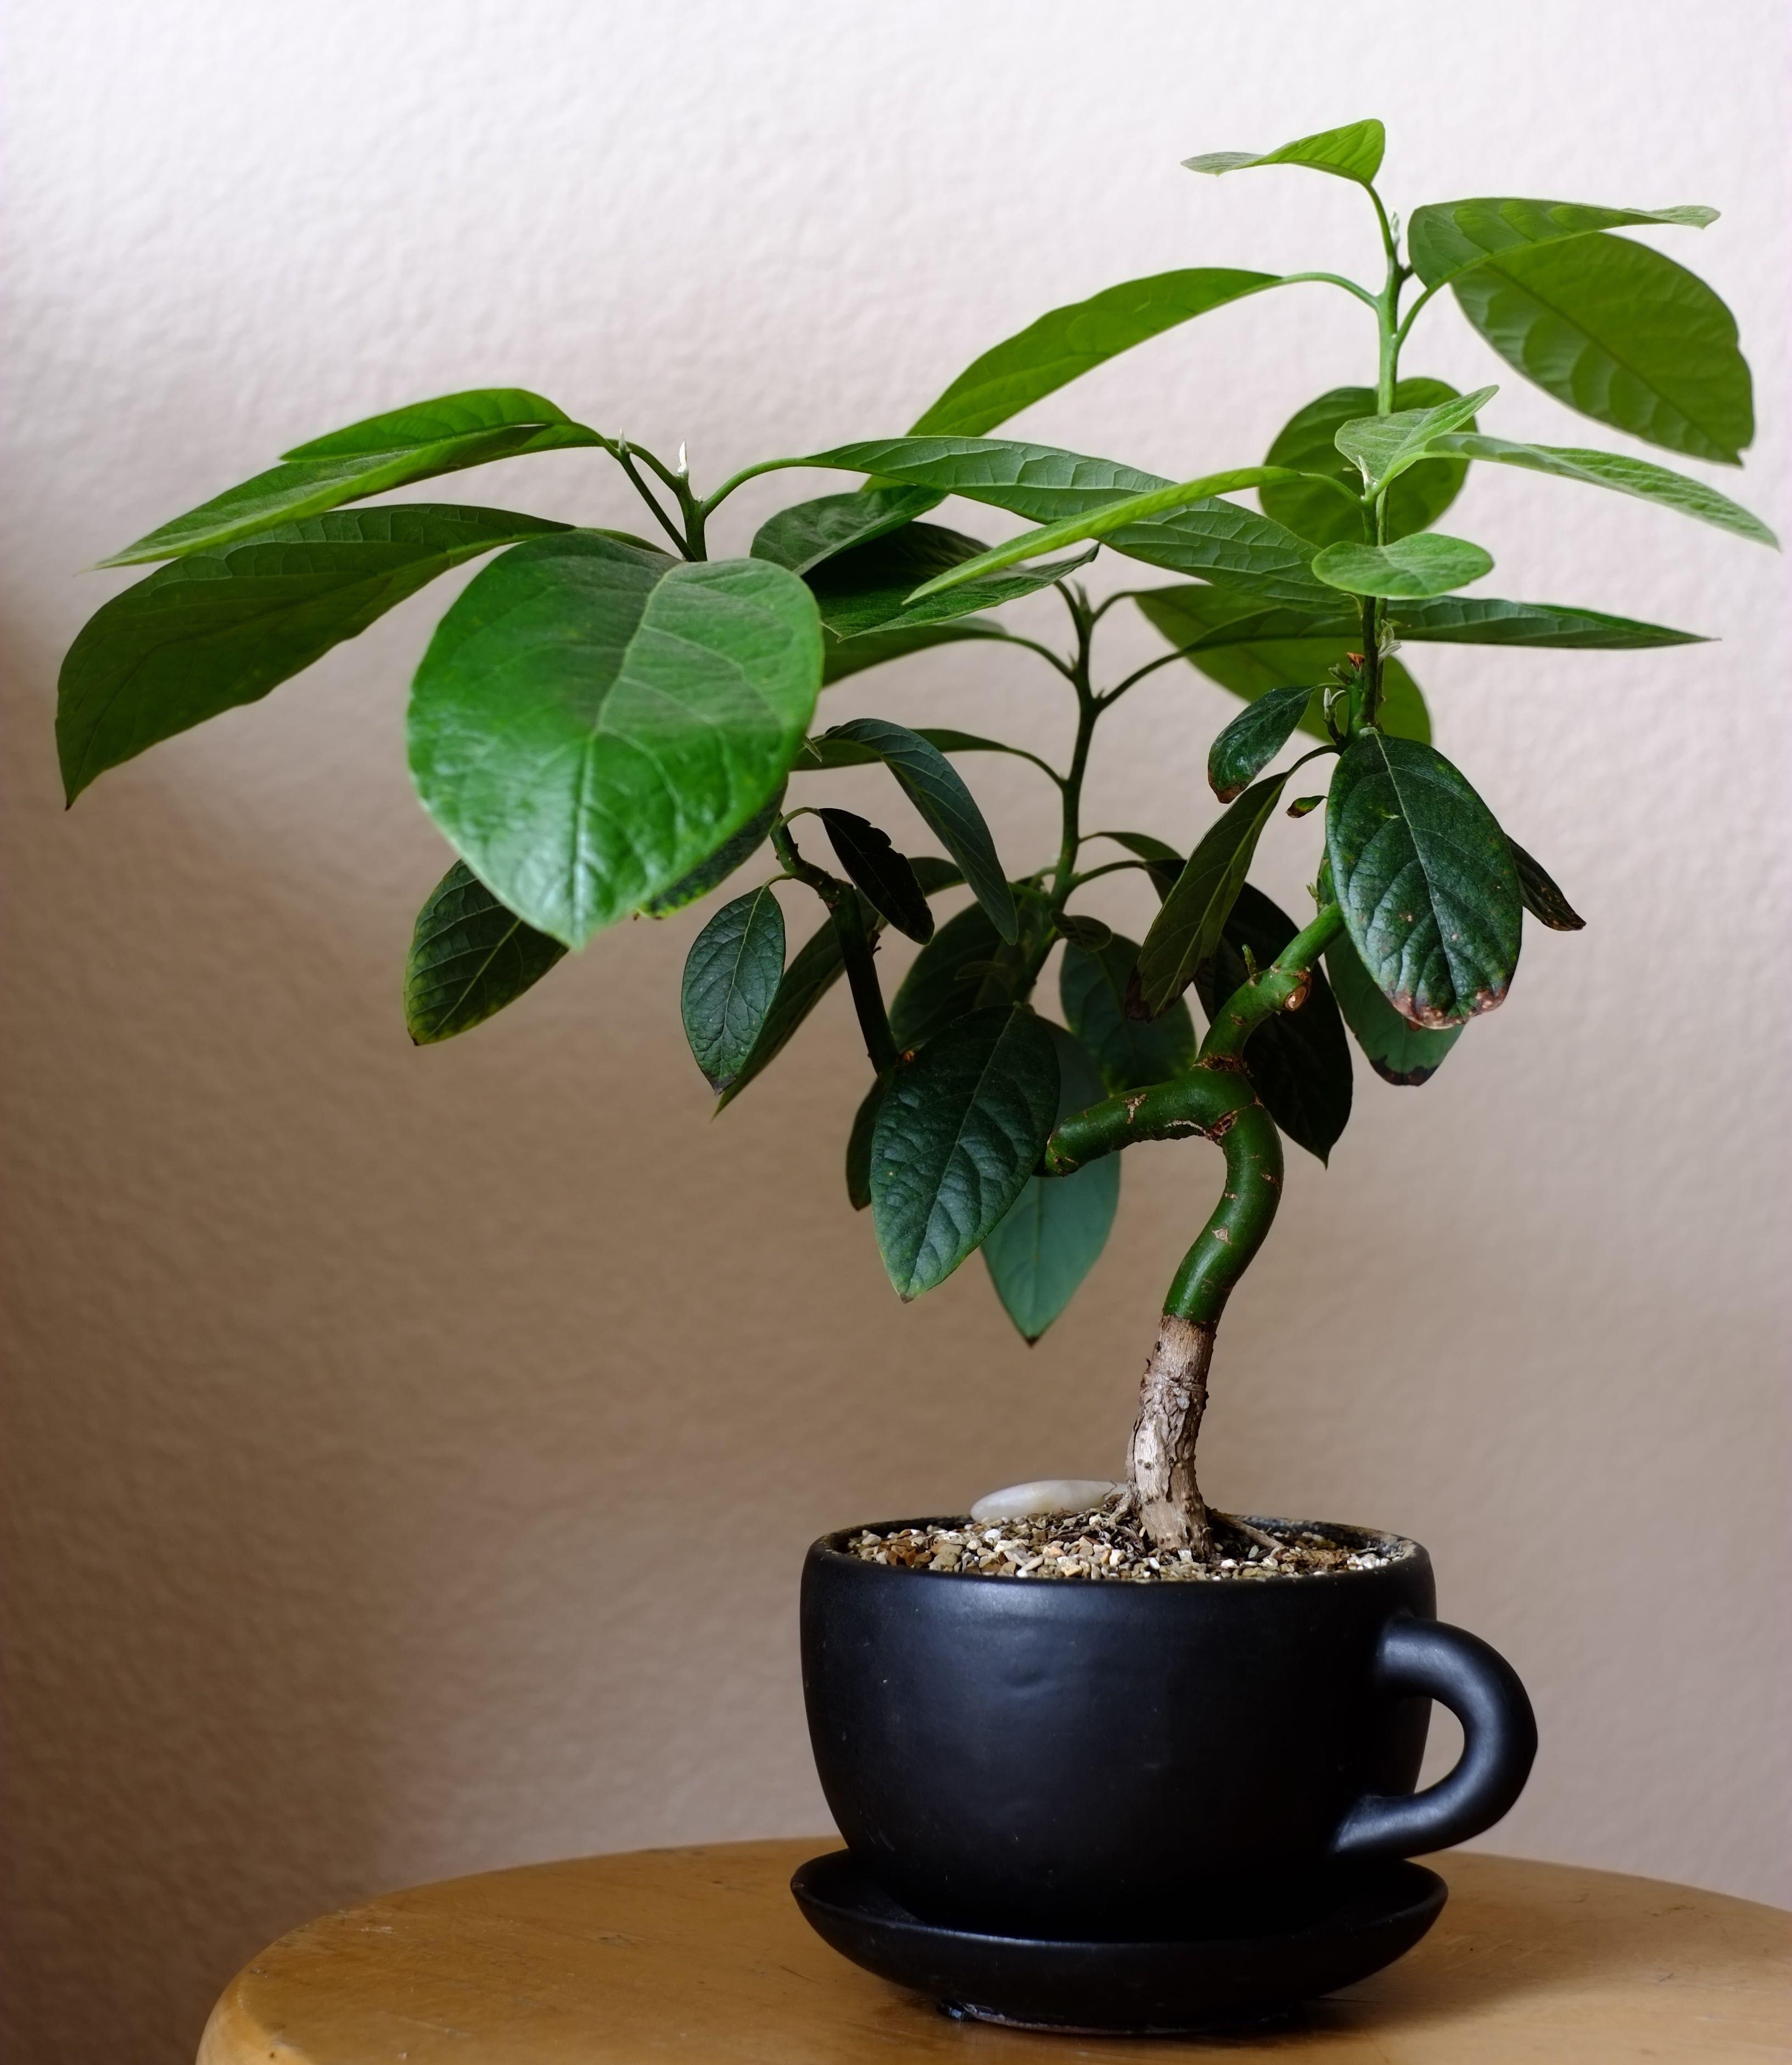 Www Helpfulgardener Com Forum Download File Php Id 17682 Mode View Jade Plant Bonsai Bonsai Plants Indoor Gardening Supplies